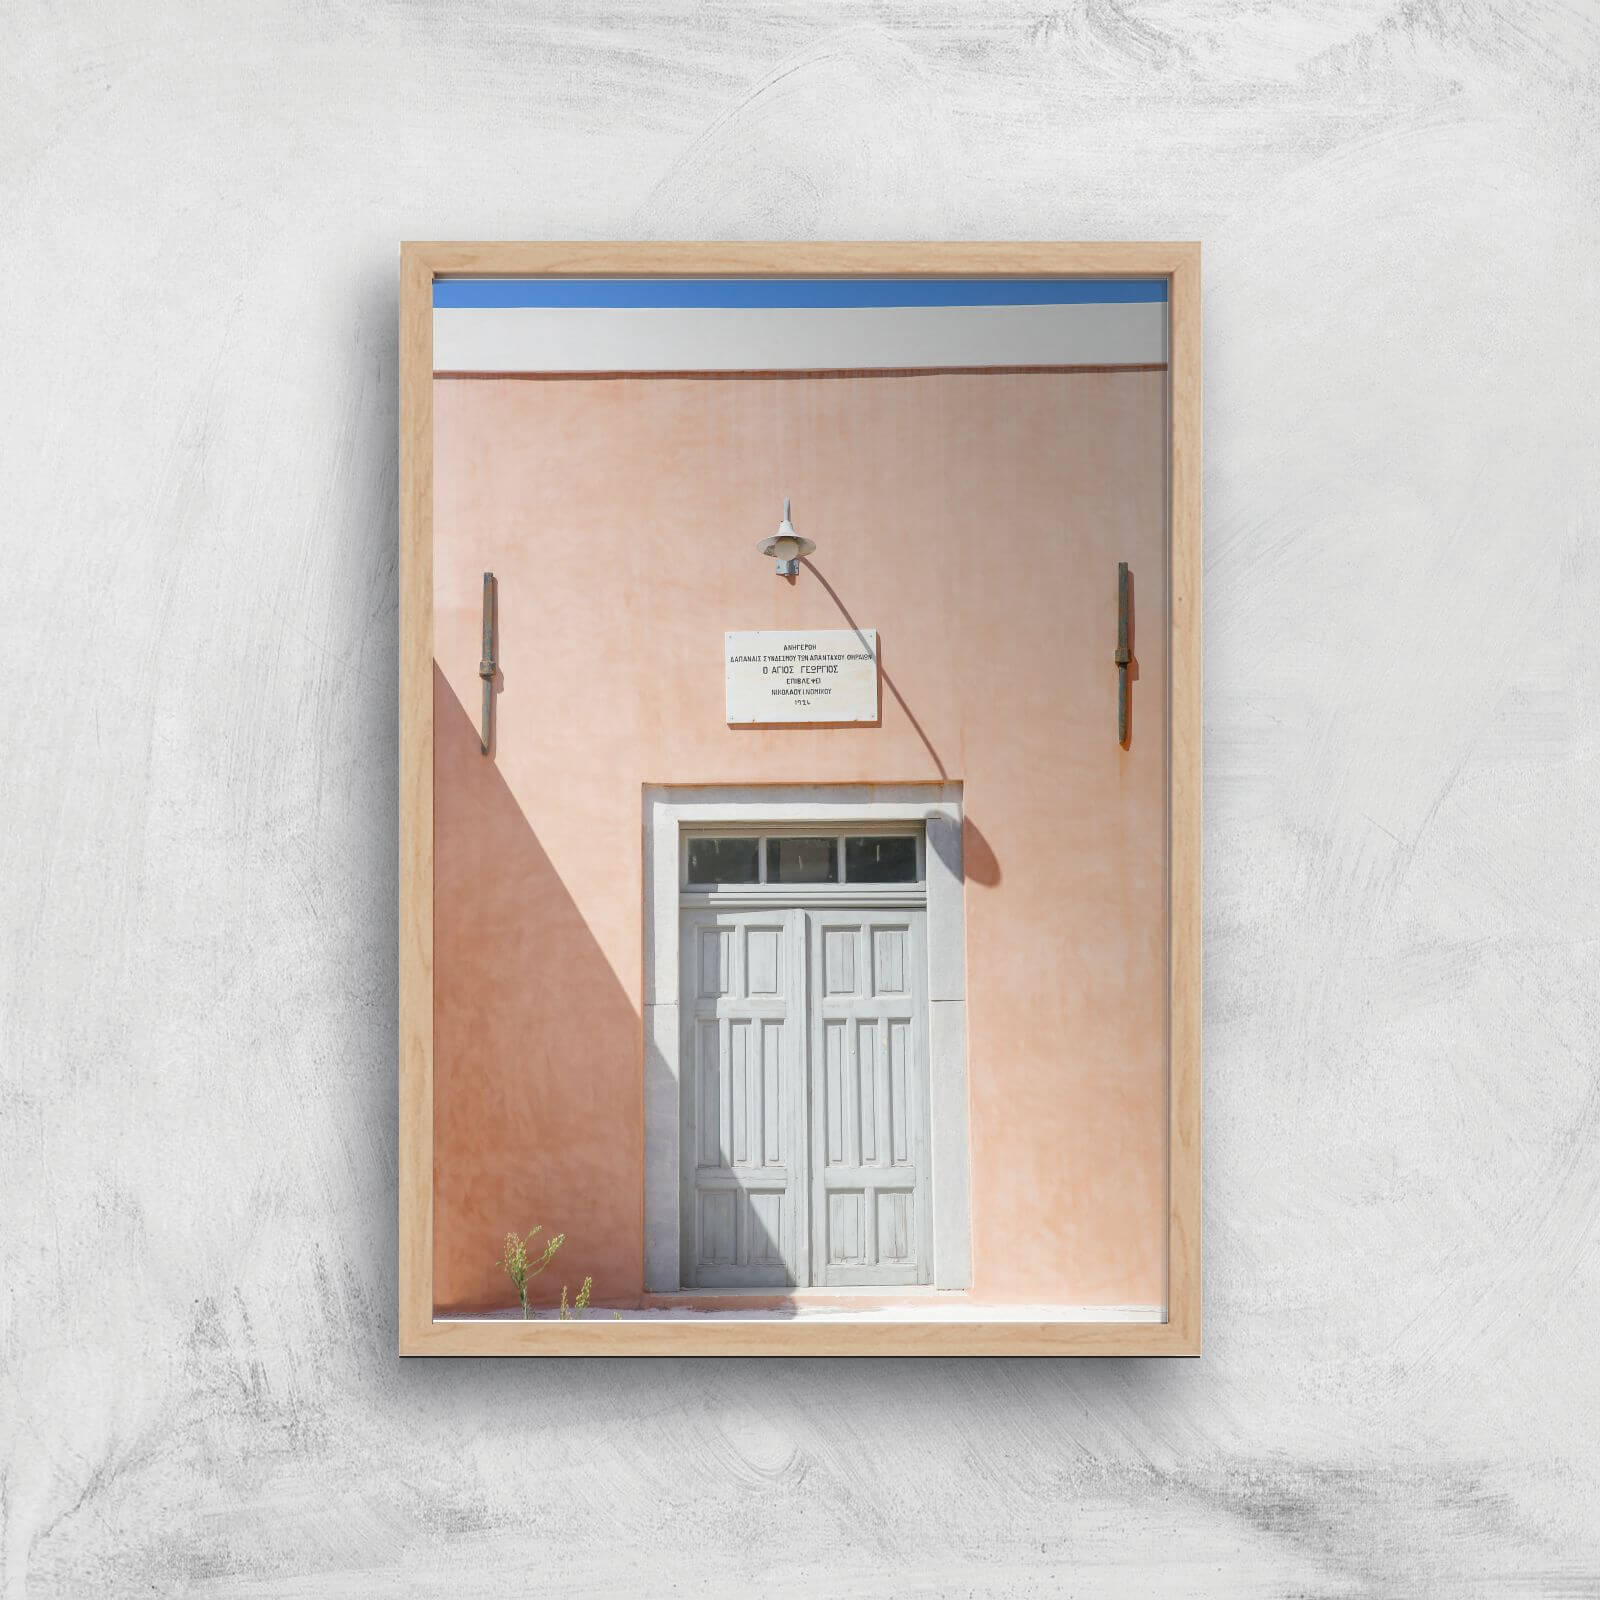 santorini secrets giclee art print - a4 - wooden frame